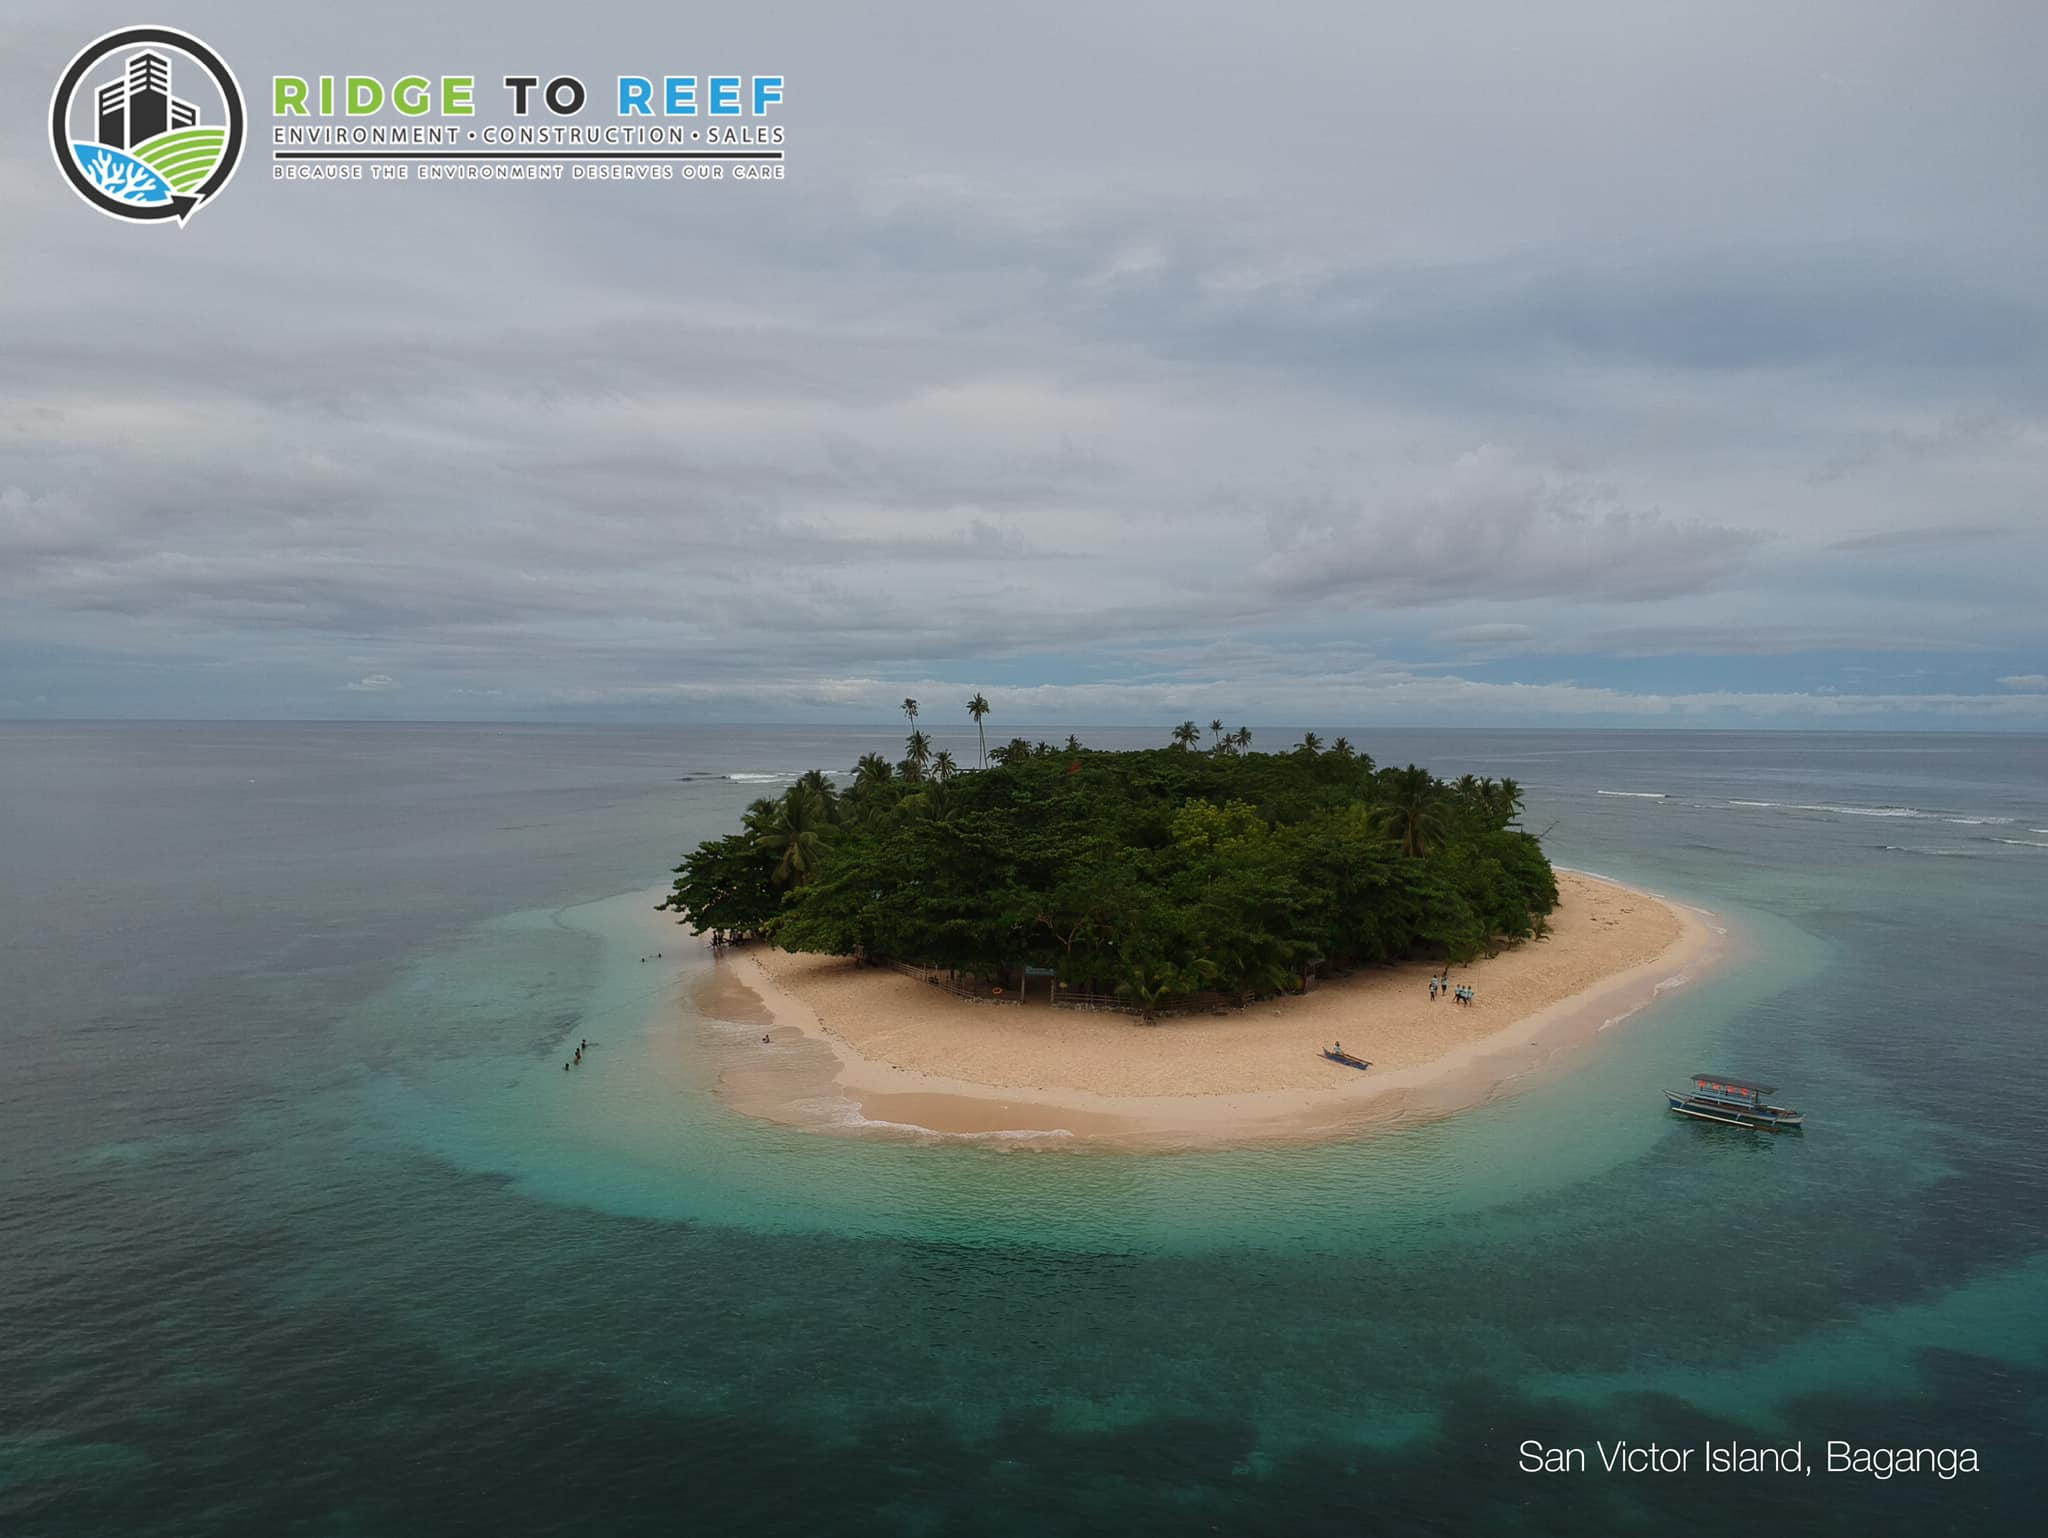 The Island of the Winners: San Victor Island, Municipality of Baganga, Province of Davao Oriental